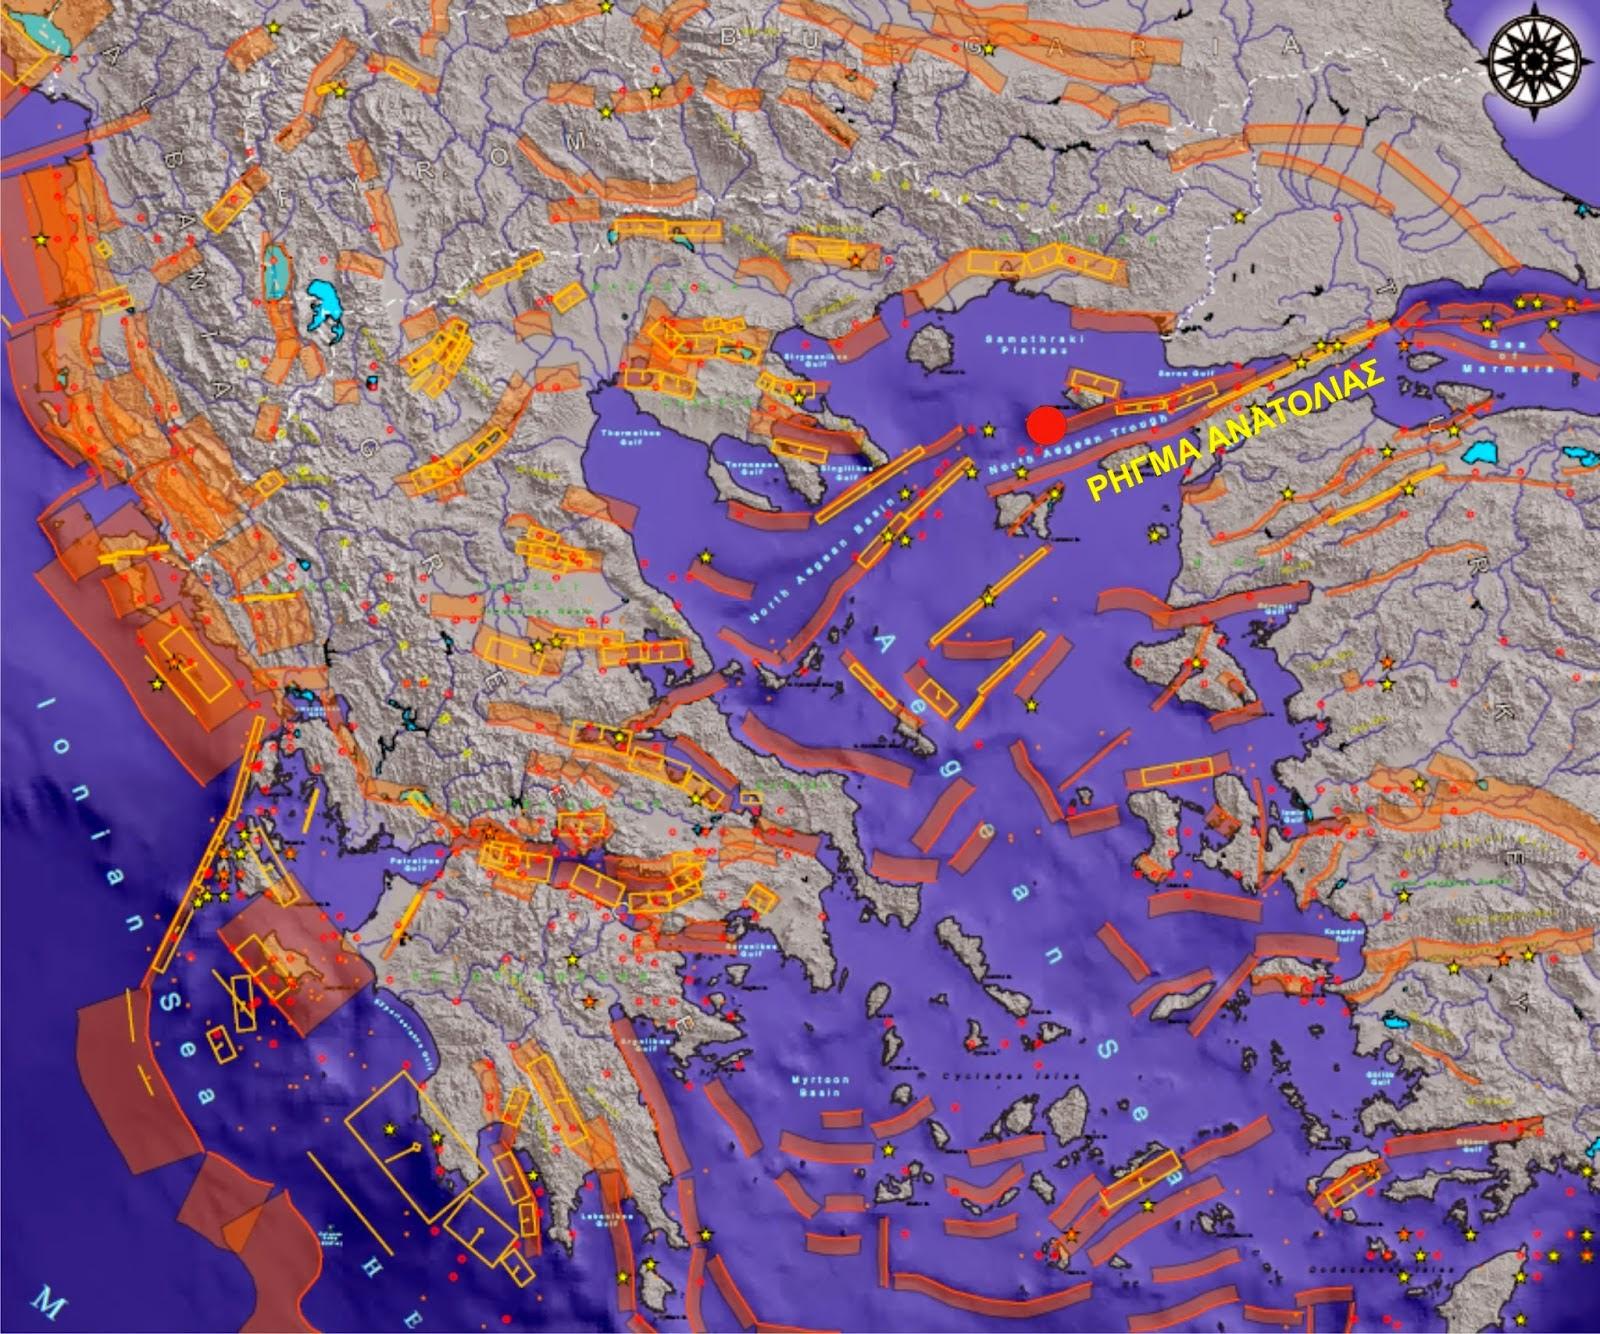 Agnwsta Seismika Rhgmata Sth B Ellada Apotypwse H Gewlogikh